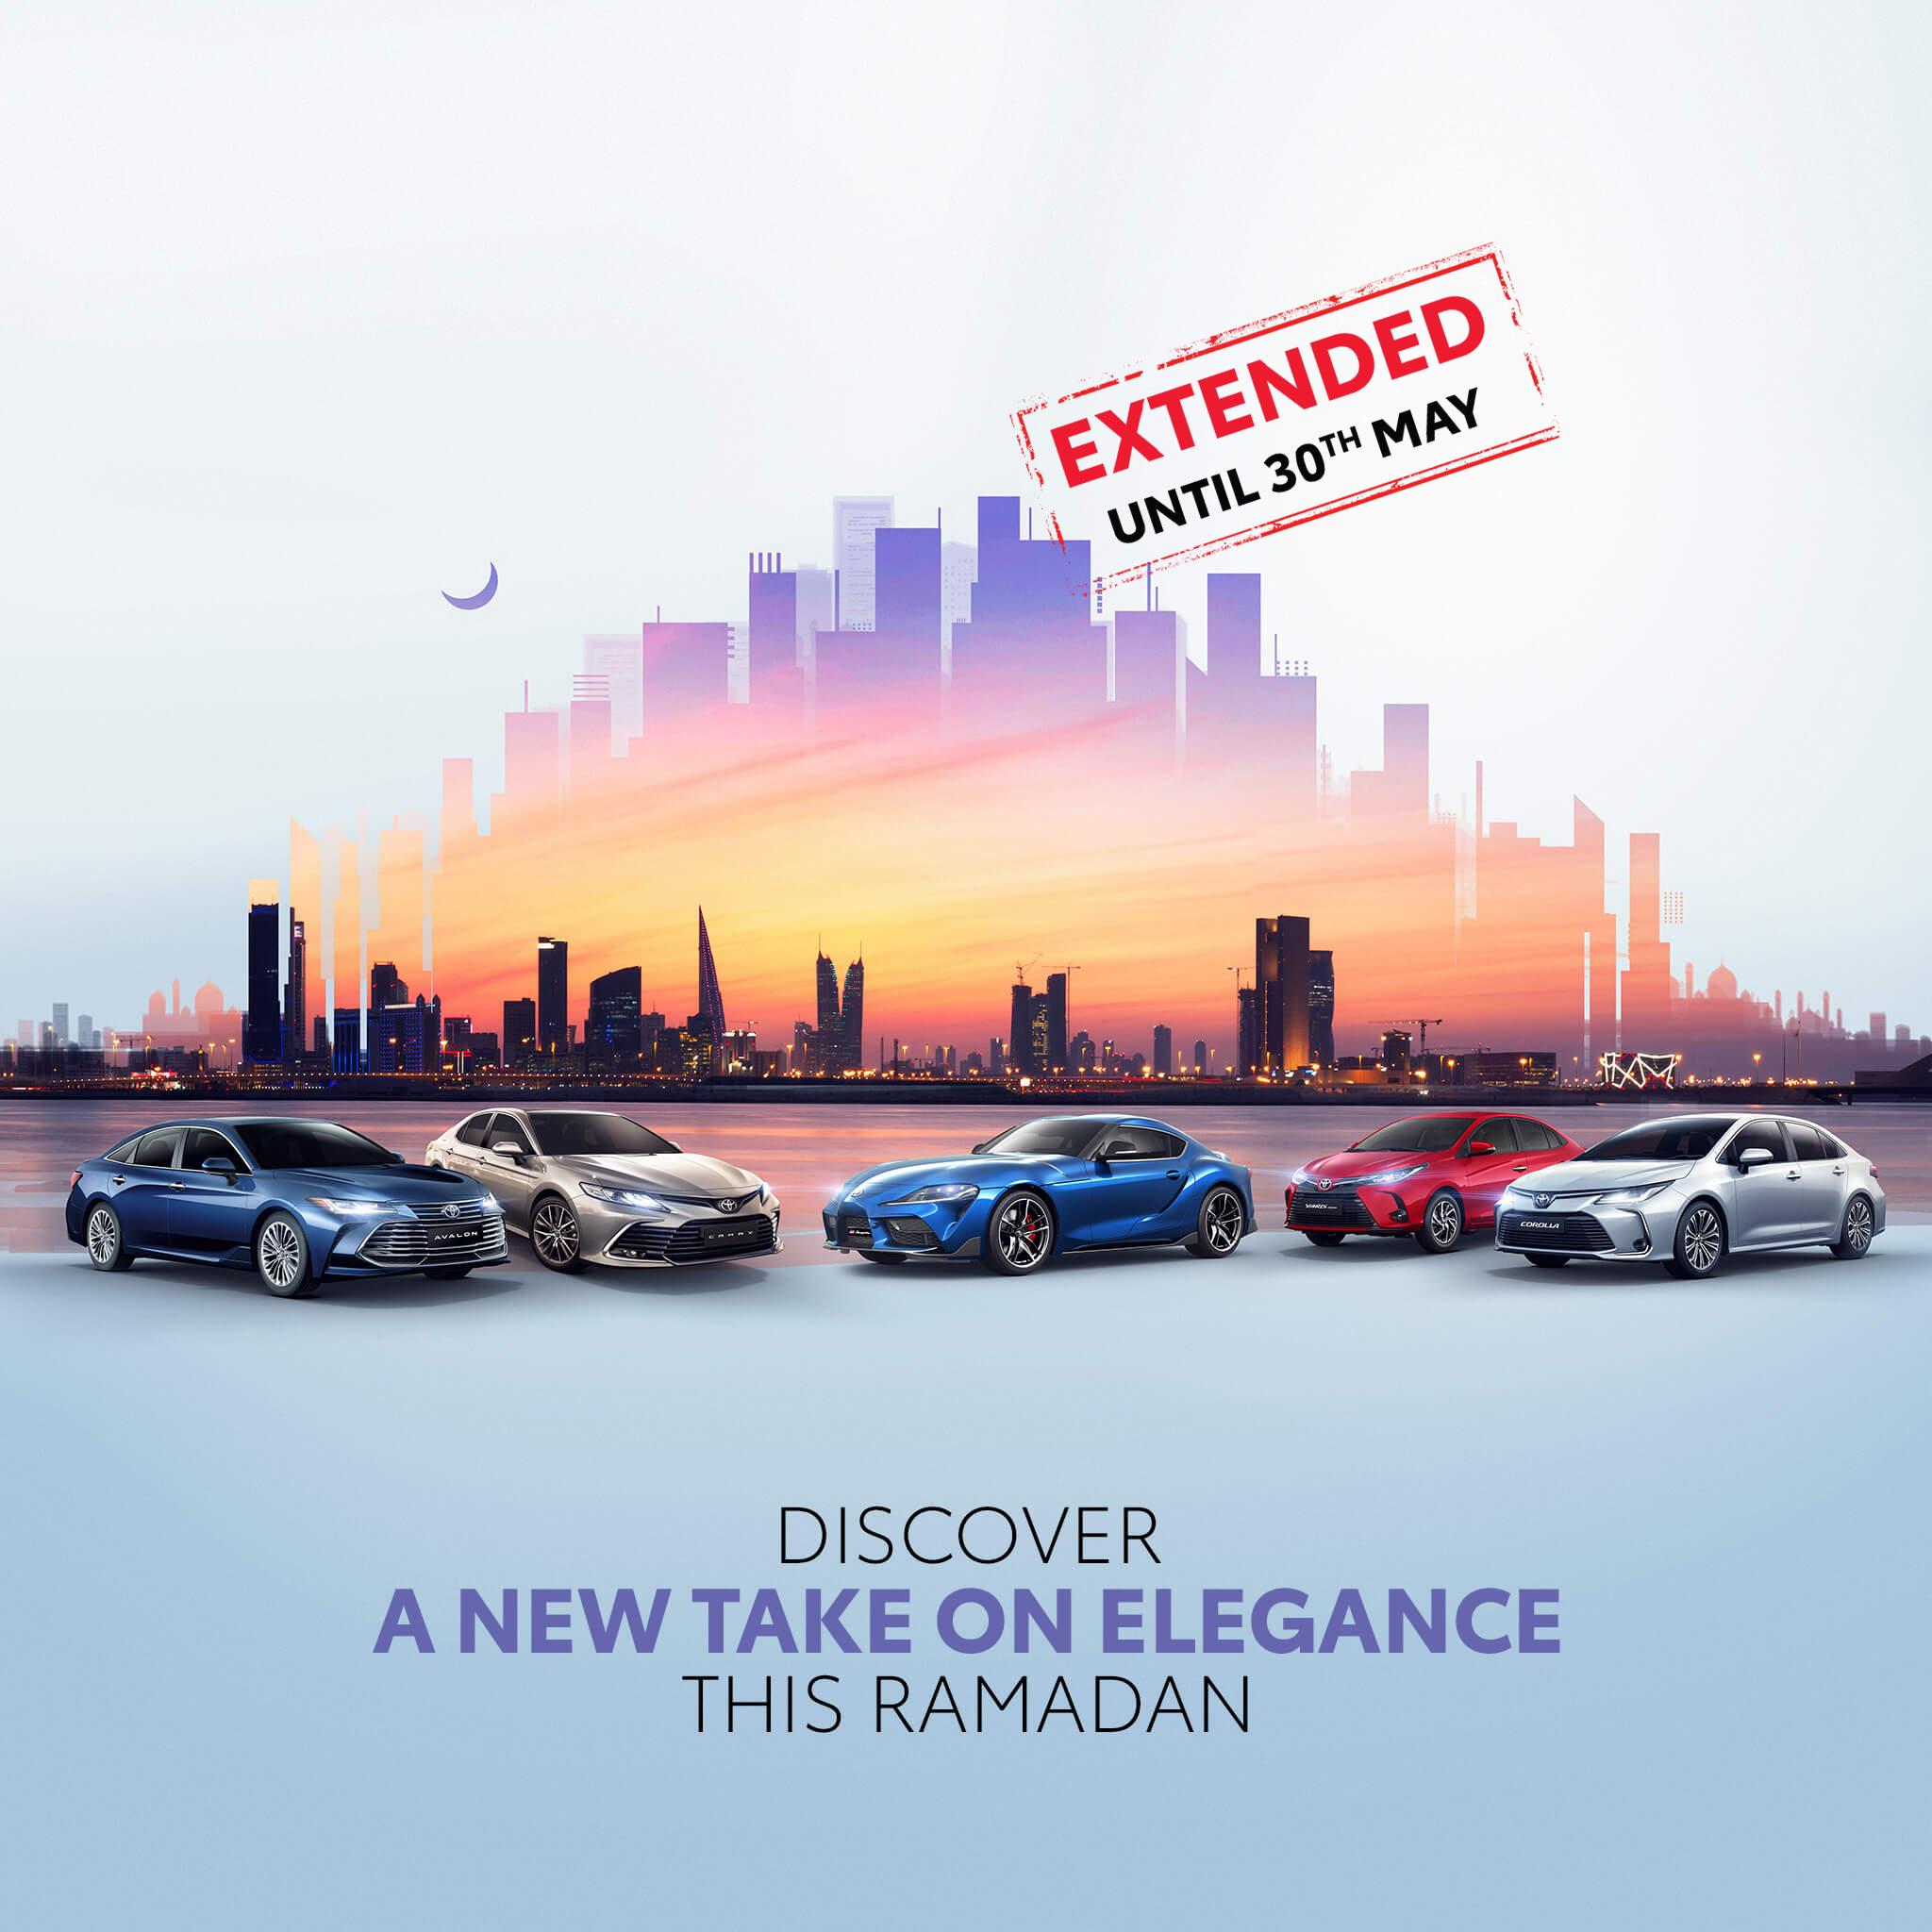 Offers for sedan toyota Bahrain 2021 Ramadan